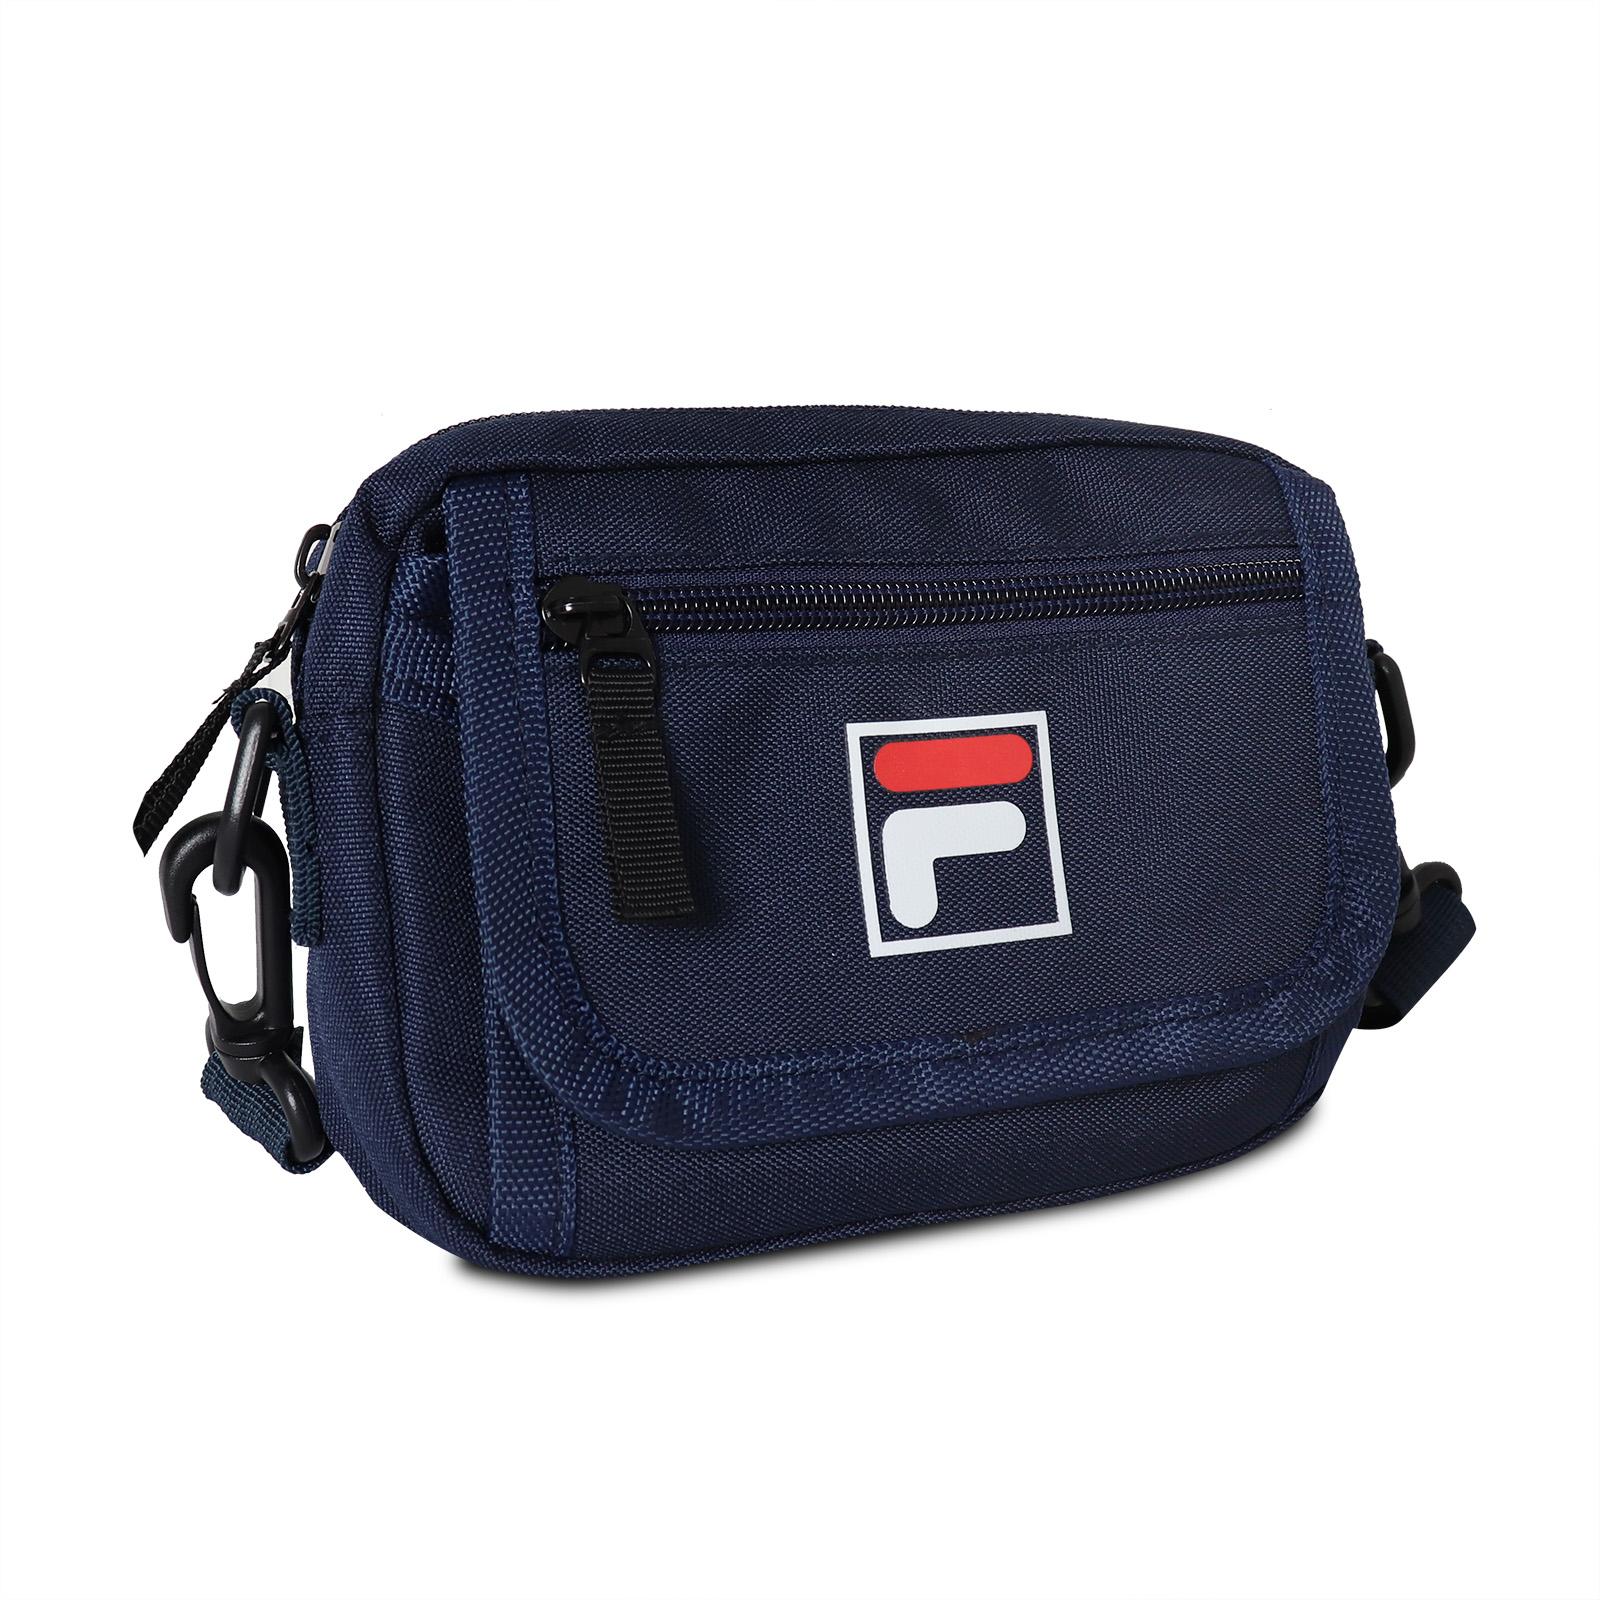 FILA 斜背包 Crossbody Shoulder Bag 藍 白 男女款 外出 側背【ACS】 BMV3018NV